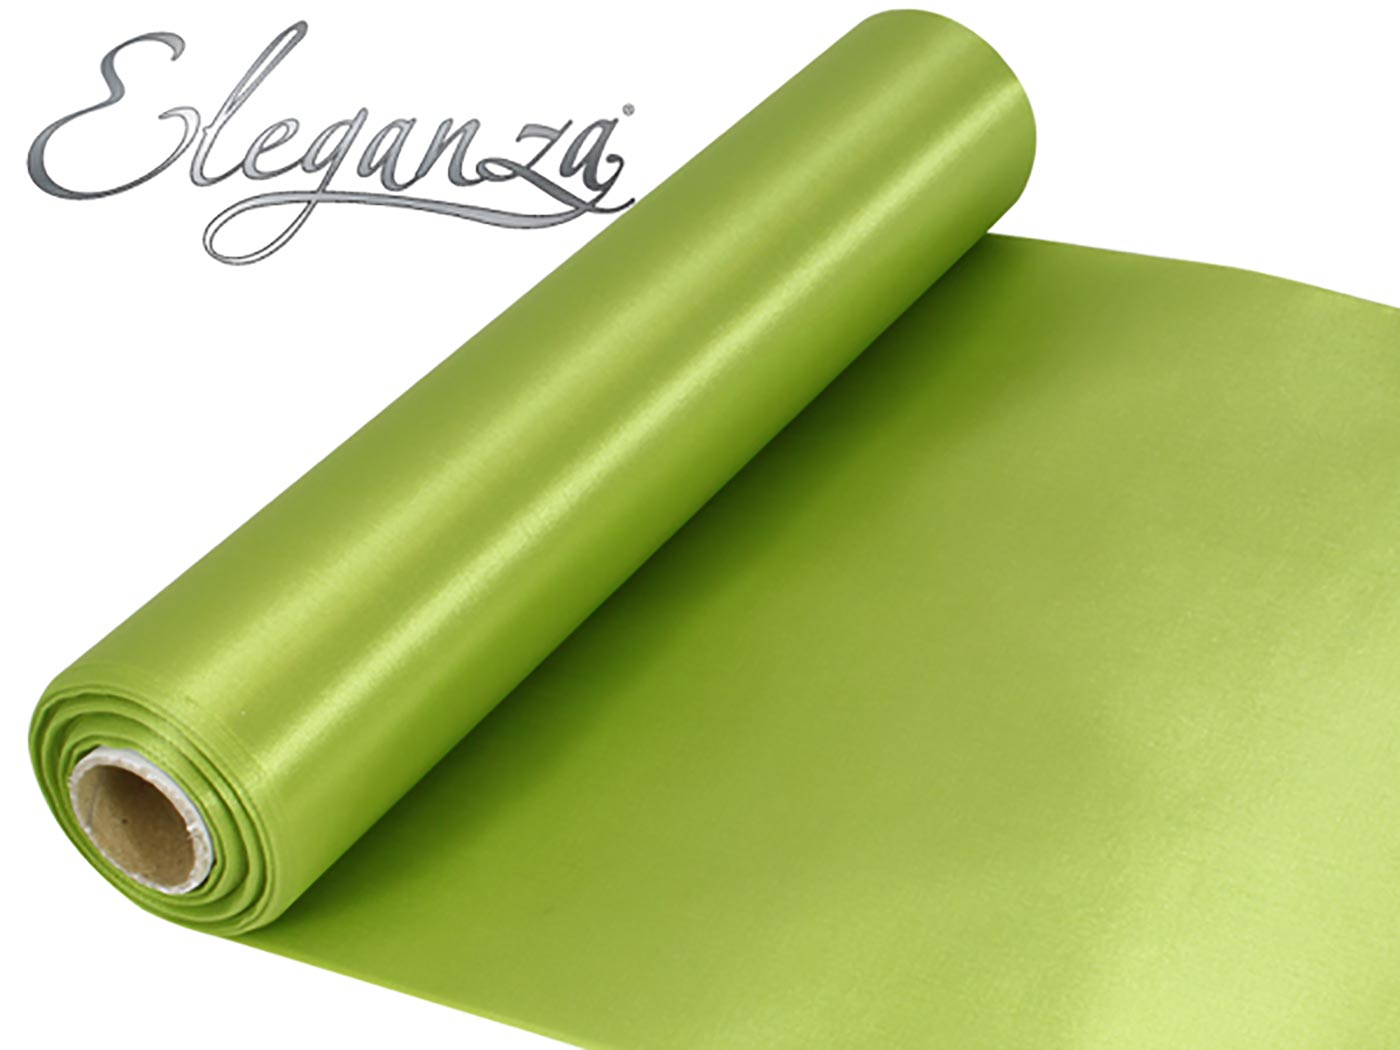 Eleganza Satin Fabric 29cm x 20m Apple Green